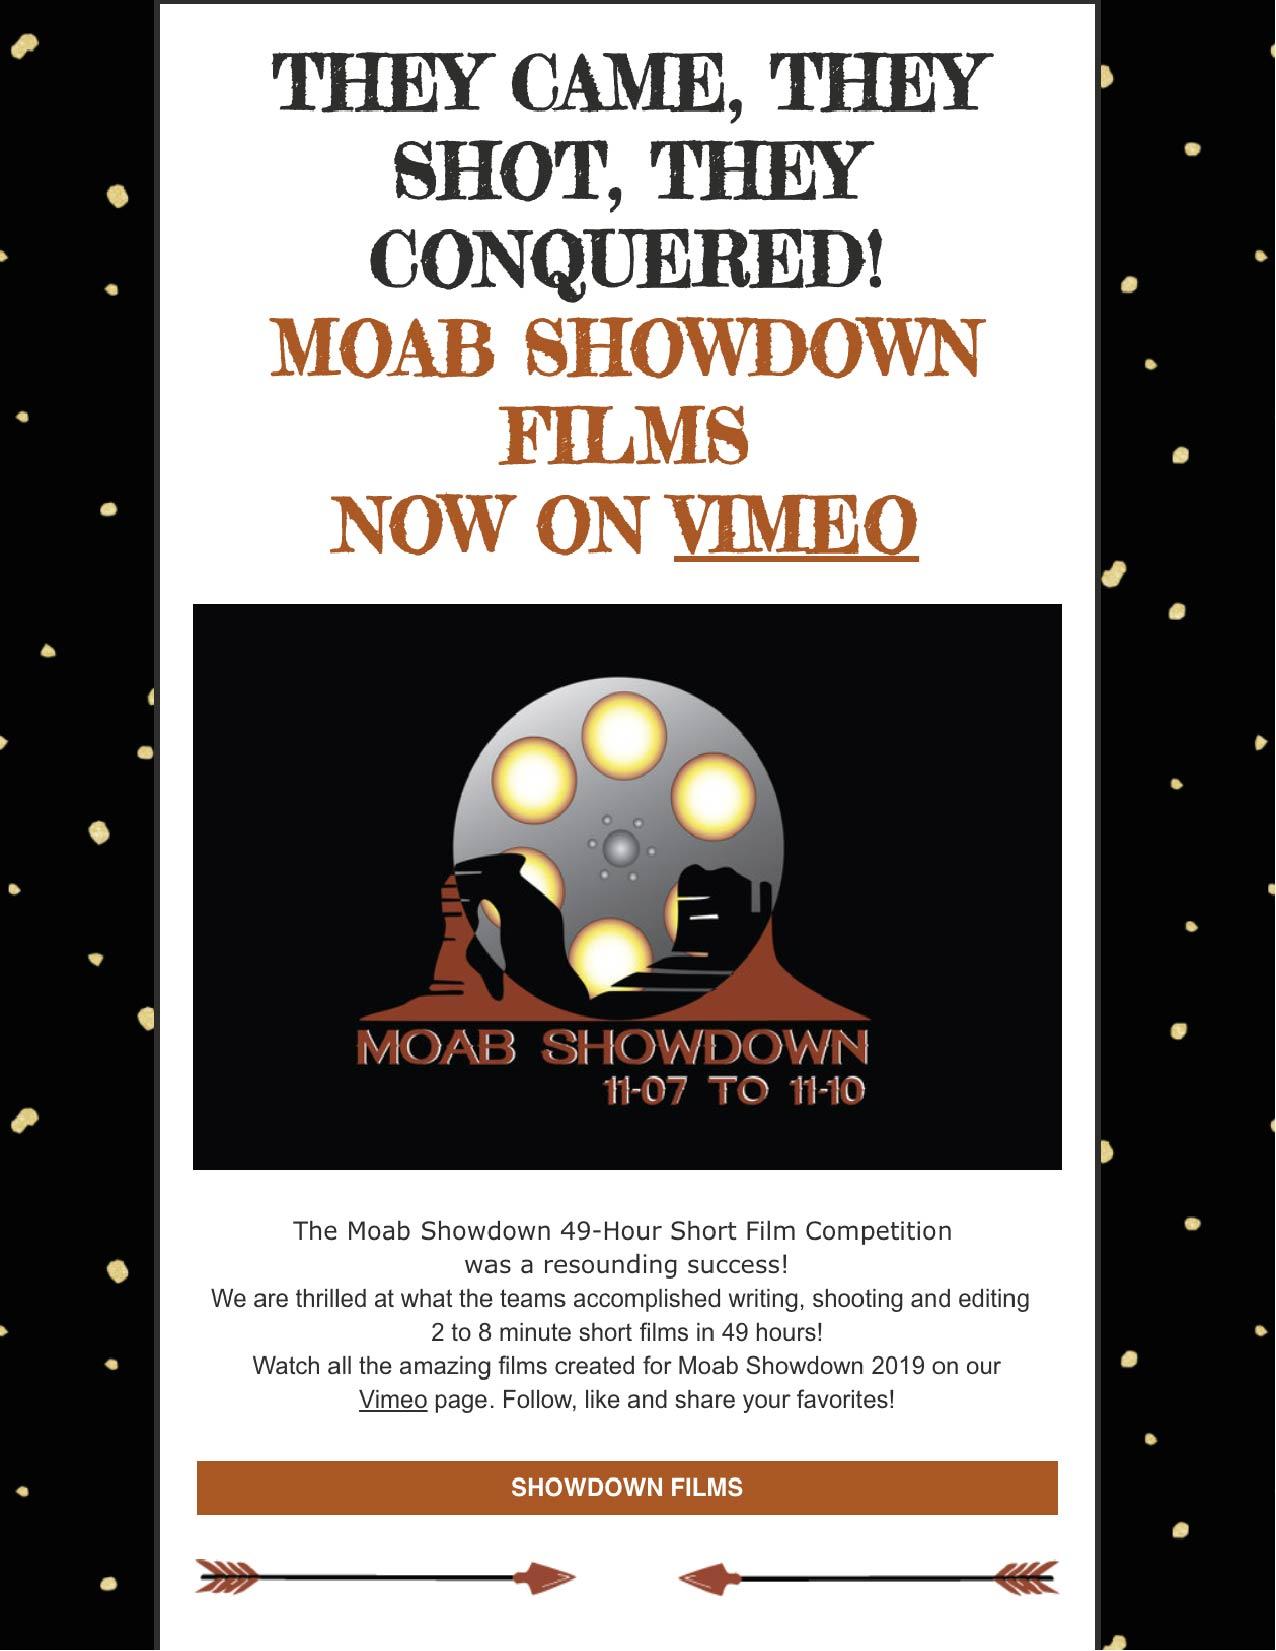 Moab Showdown films now on Vimeo